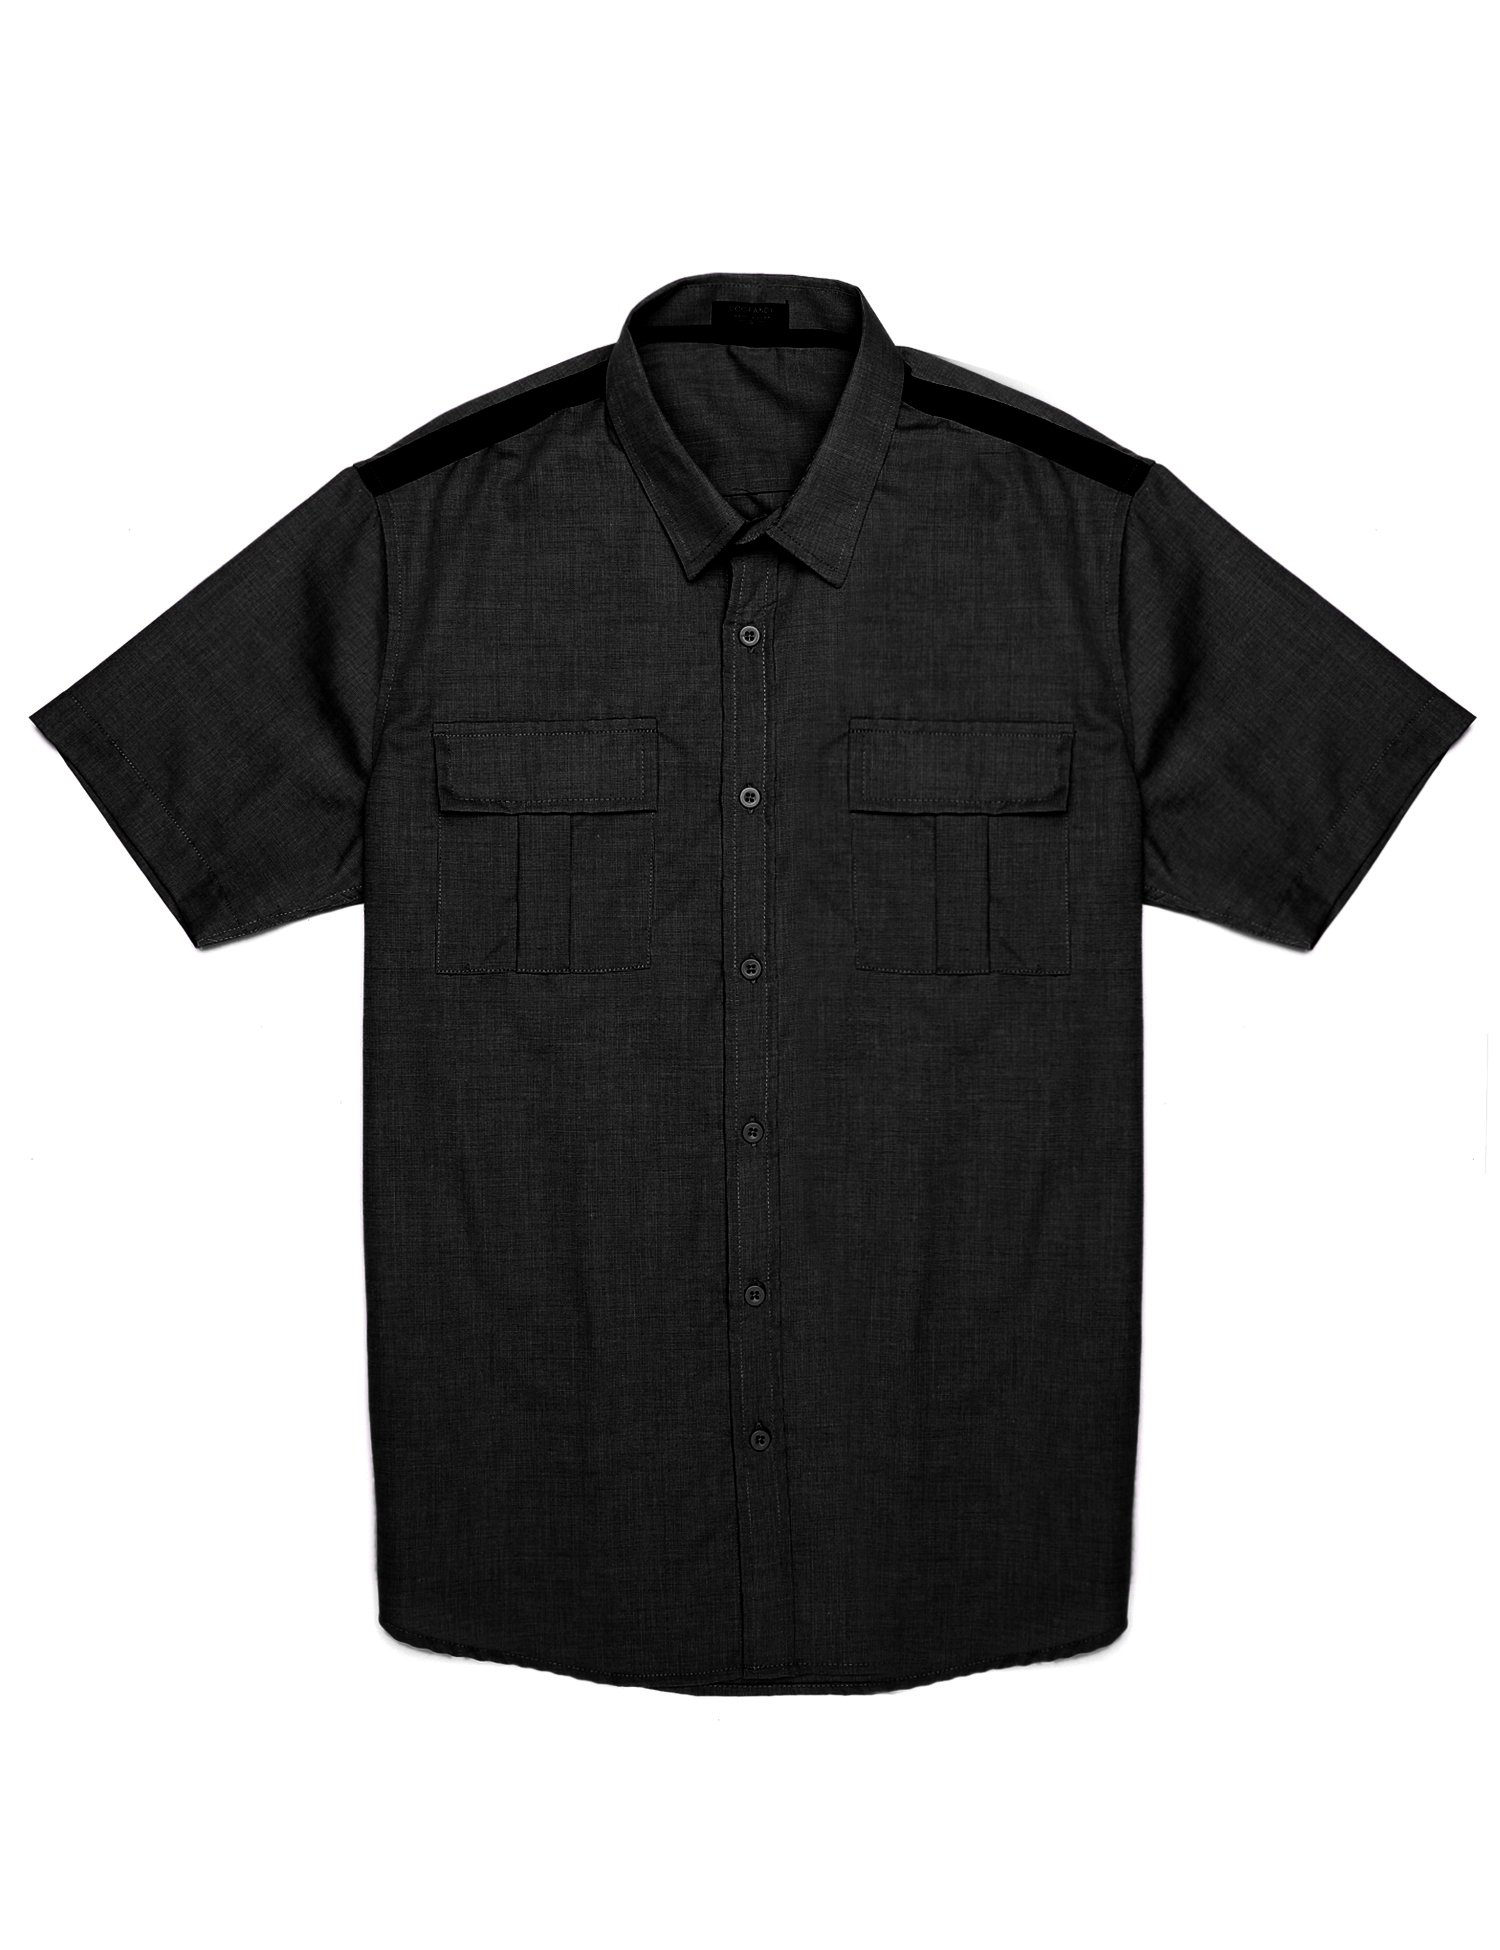 COOFANDY Men's Short Sleeve Button Down Shirt Casual Slim Fit Dress Shirts Black